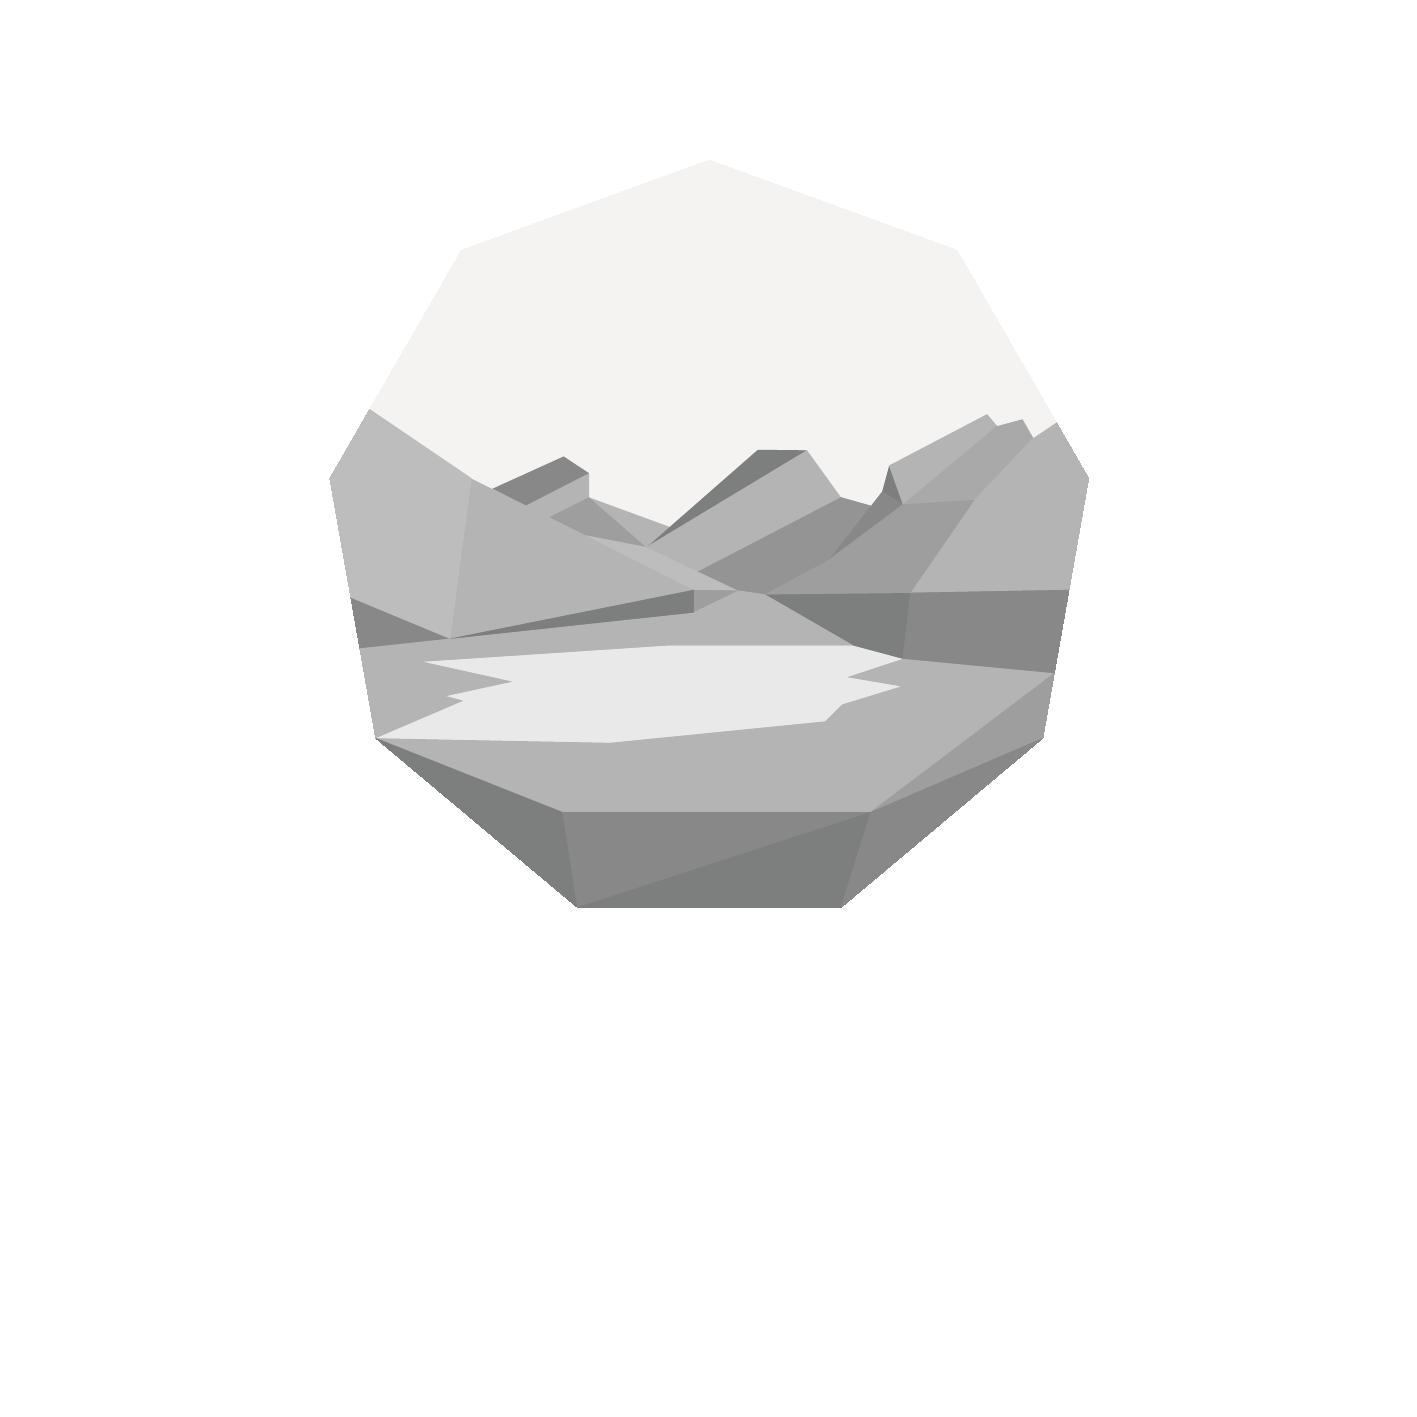 Timo Kellenberger